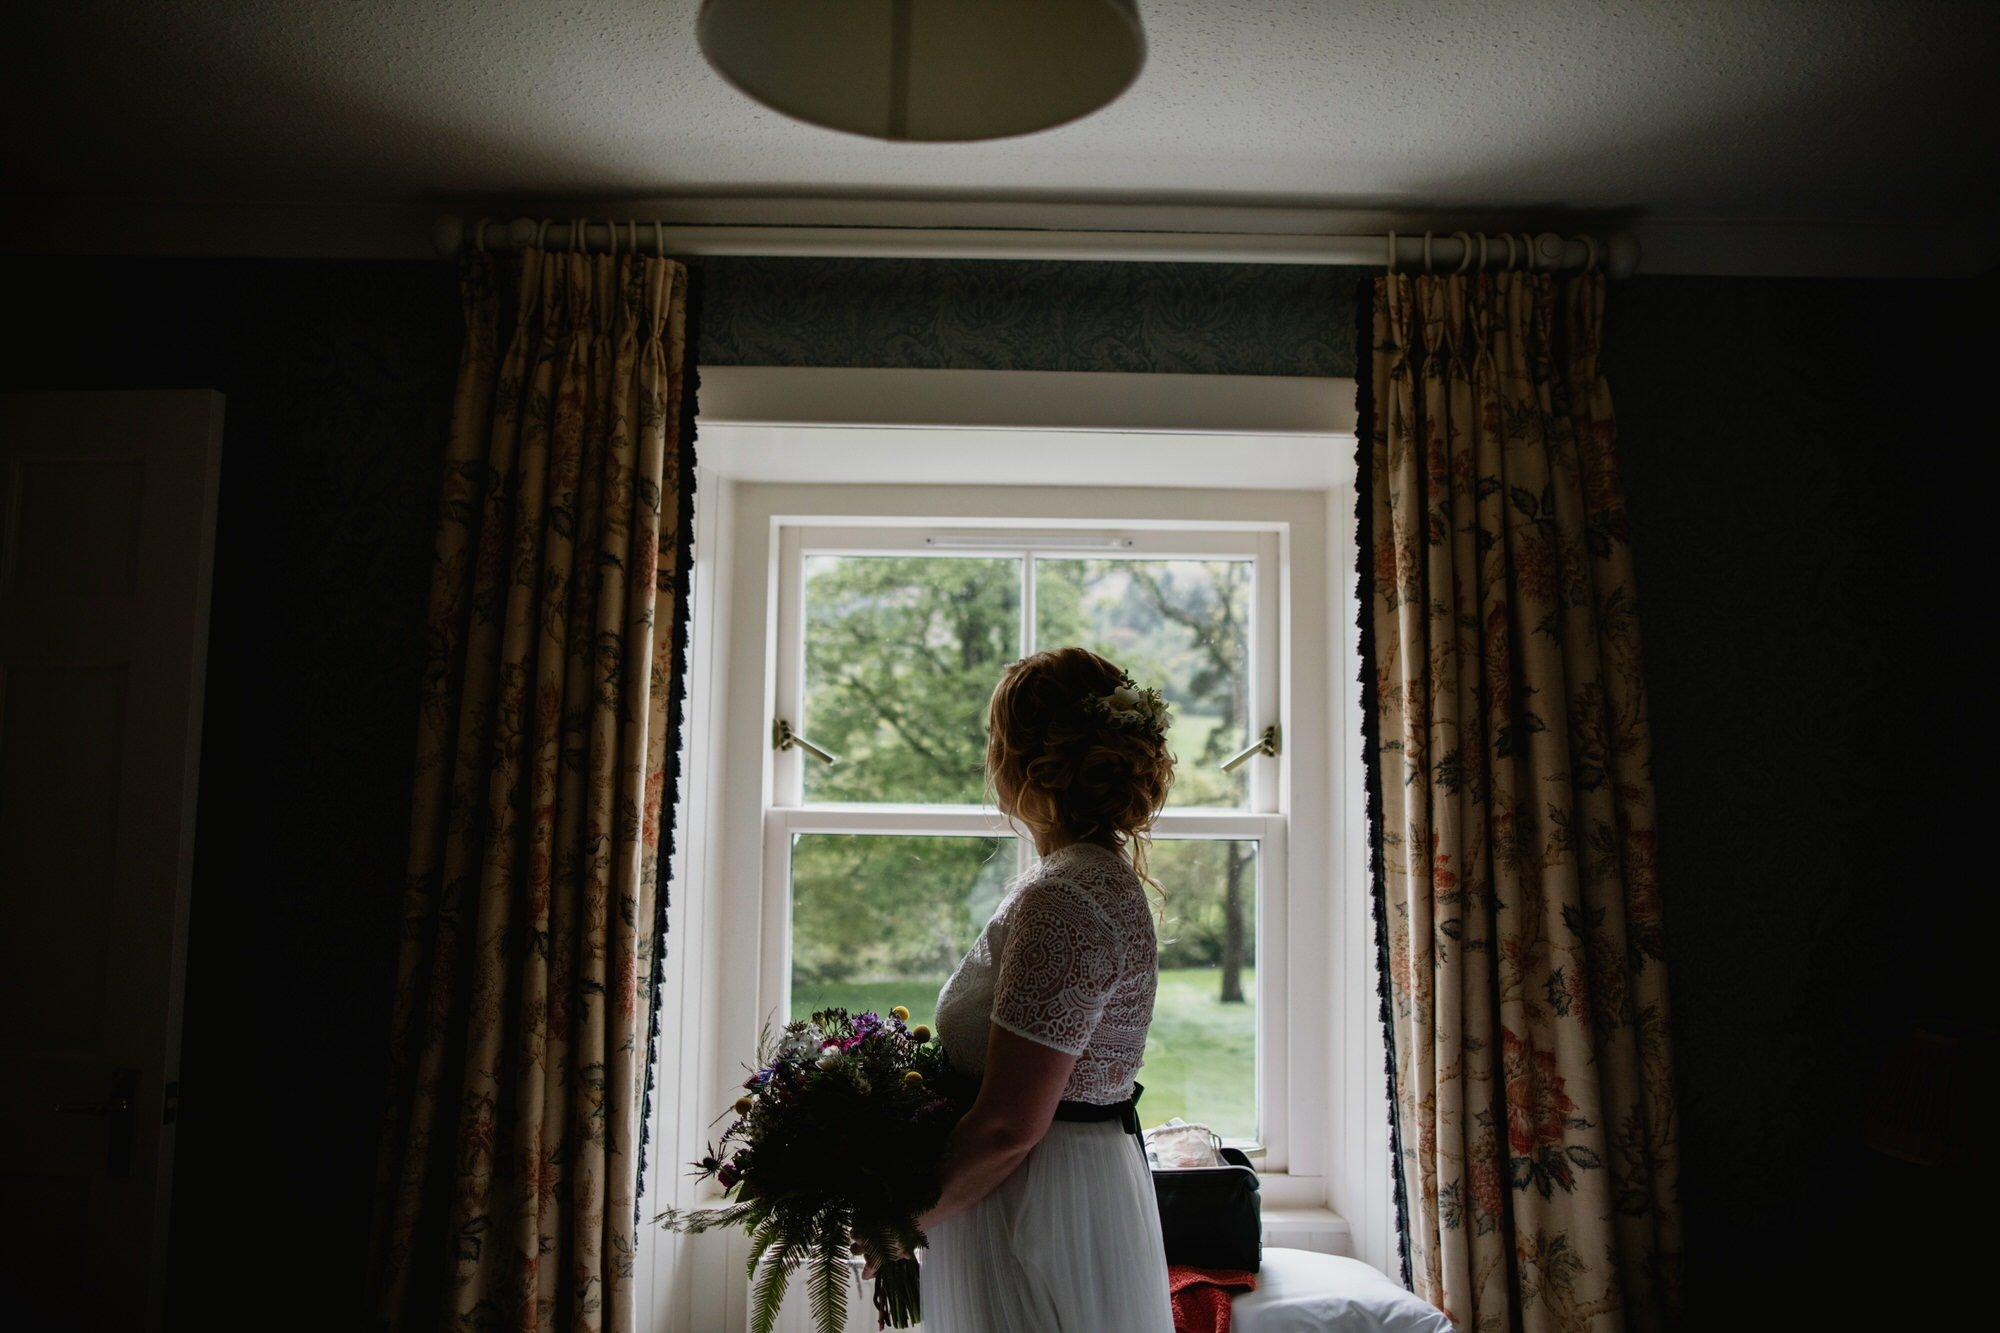 014 TIN SHED KNOCKRAICH WEDDING AUSTRIAN SCOTTISH ZOE ALEXANDRA PHOTOGRAPHY